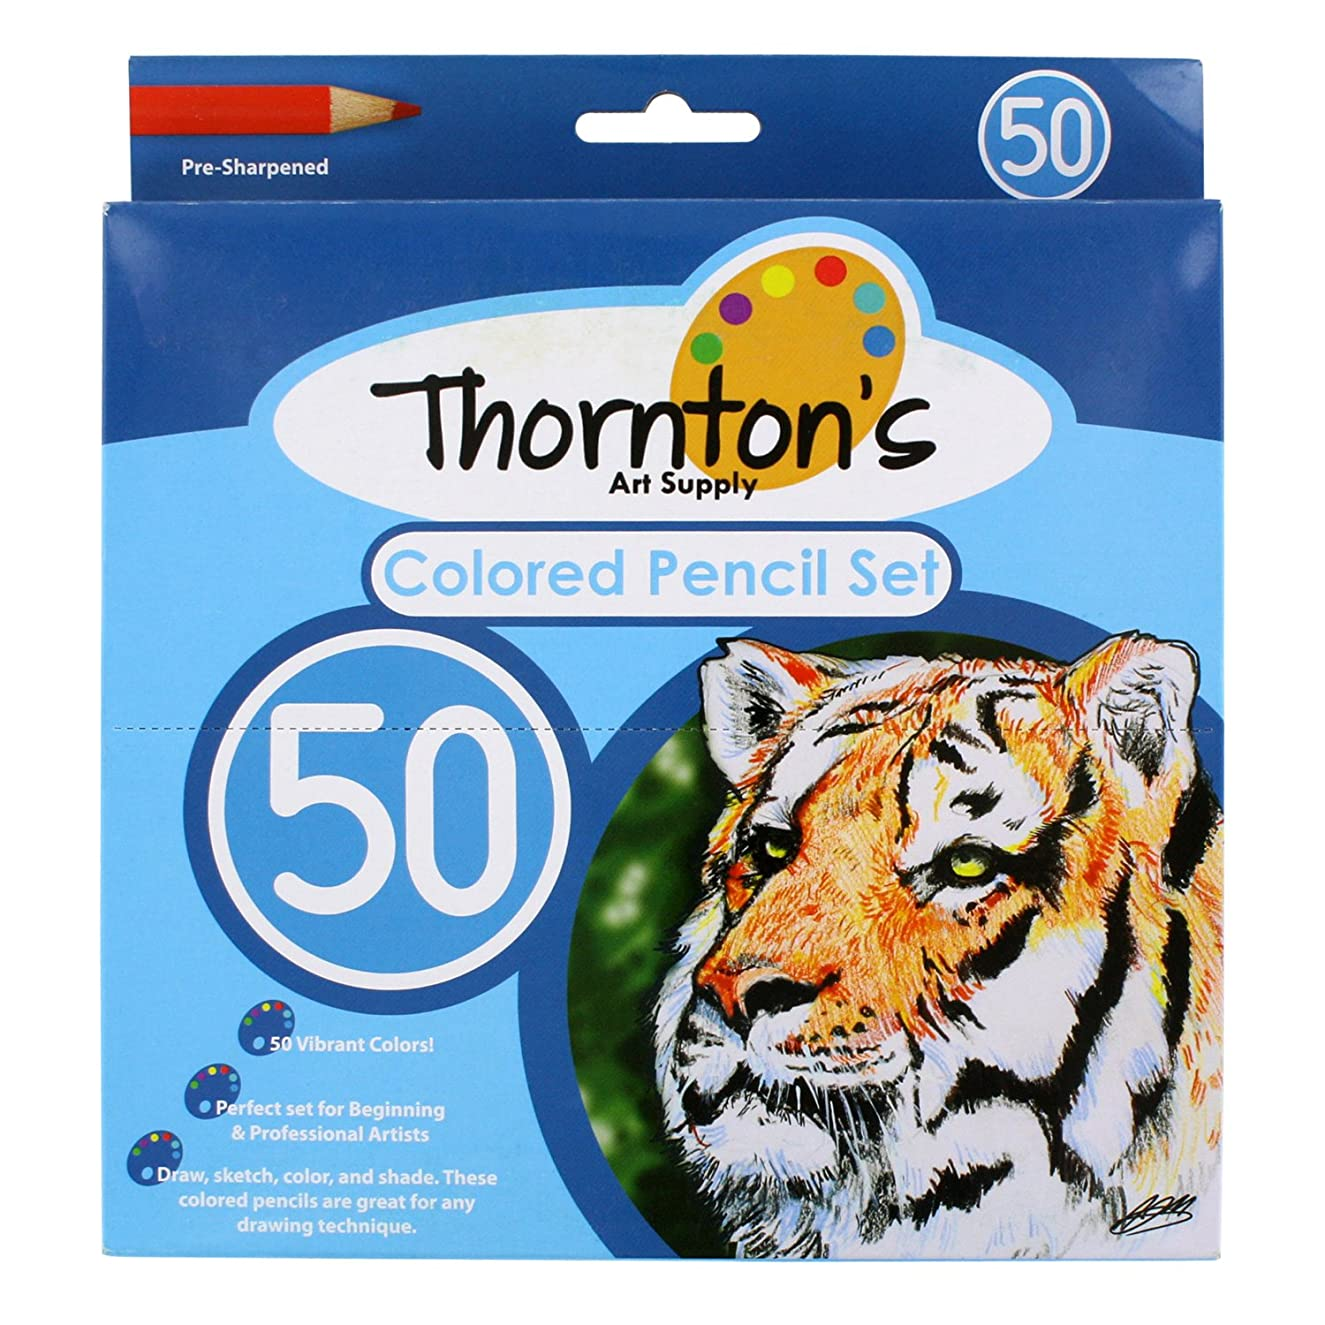 Thornton's Art Supply 50 Piece Premier Soft Core Artist Grade Colored Pencil Set, Assorted Colors